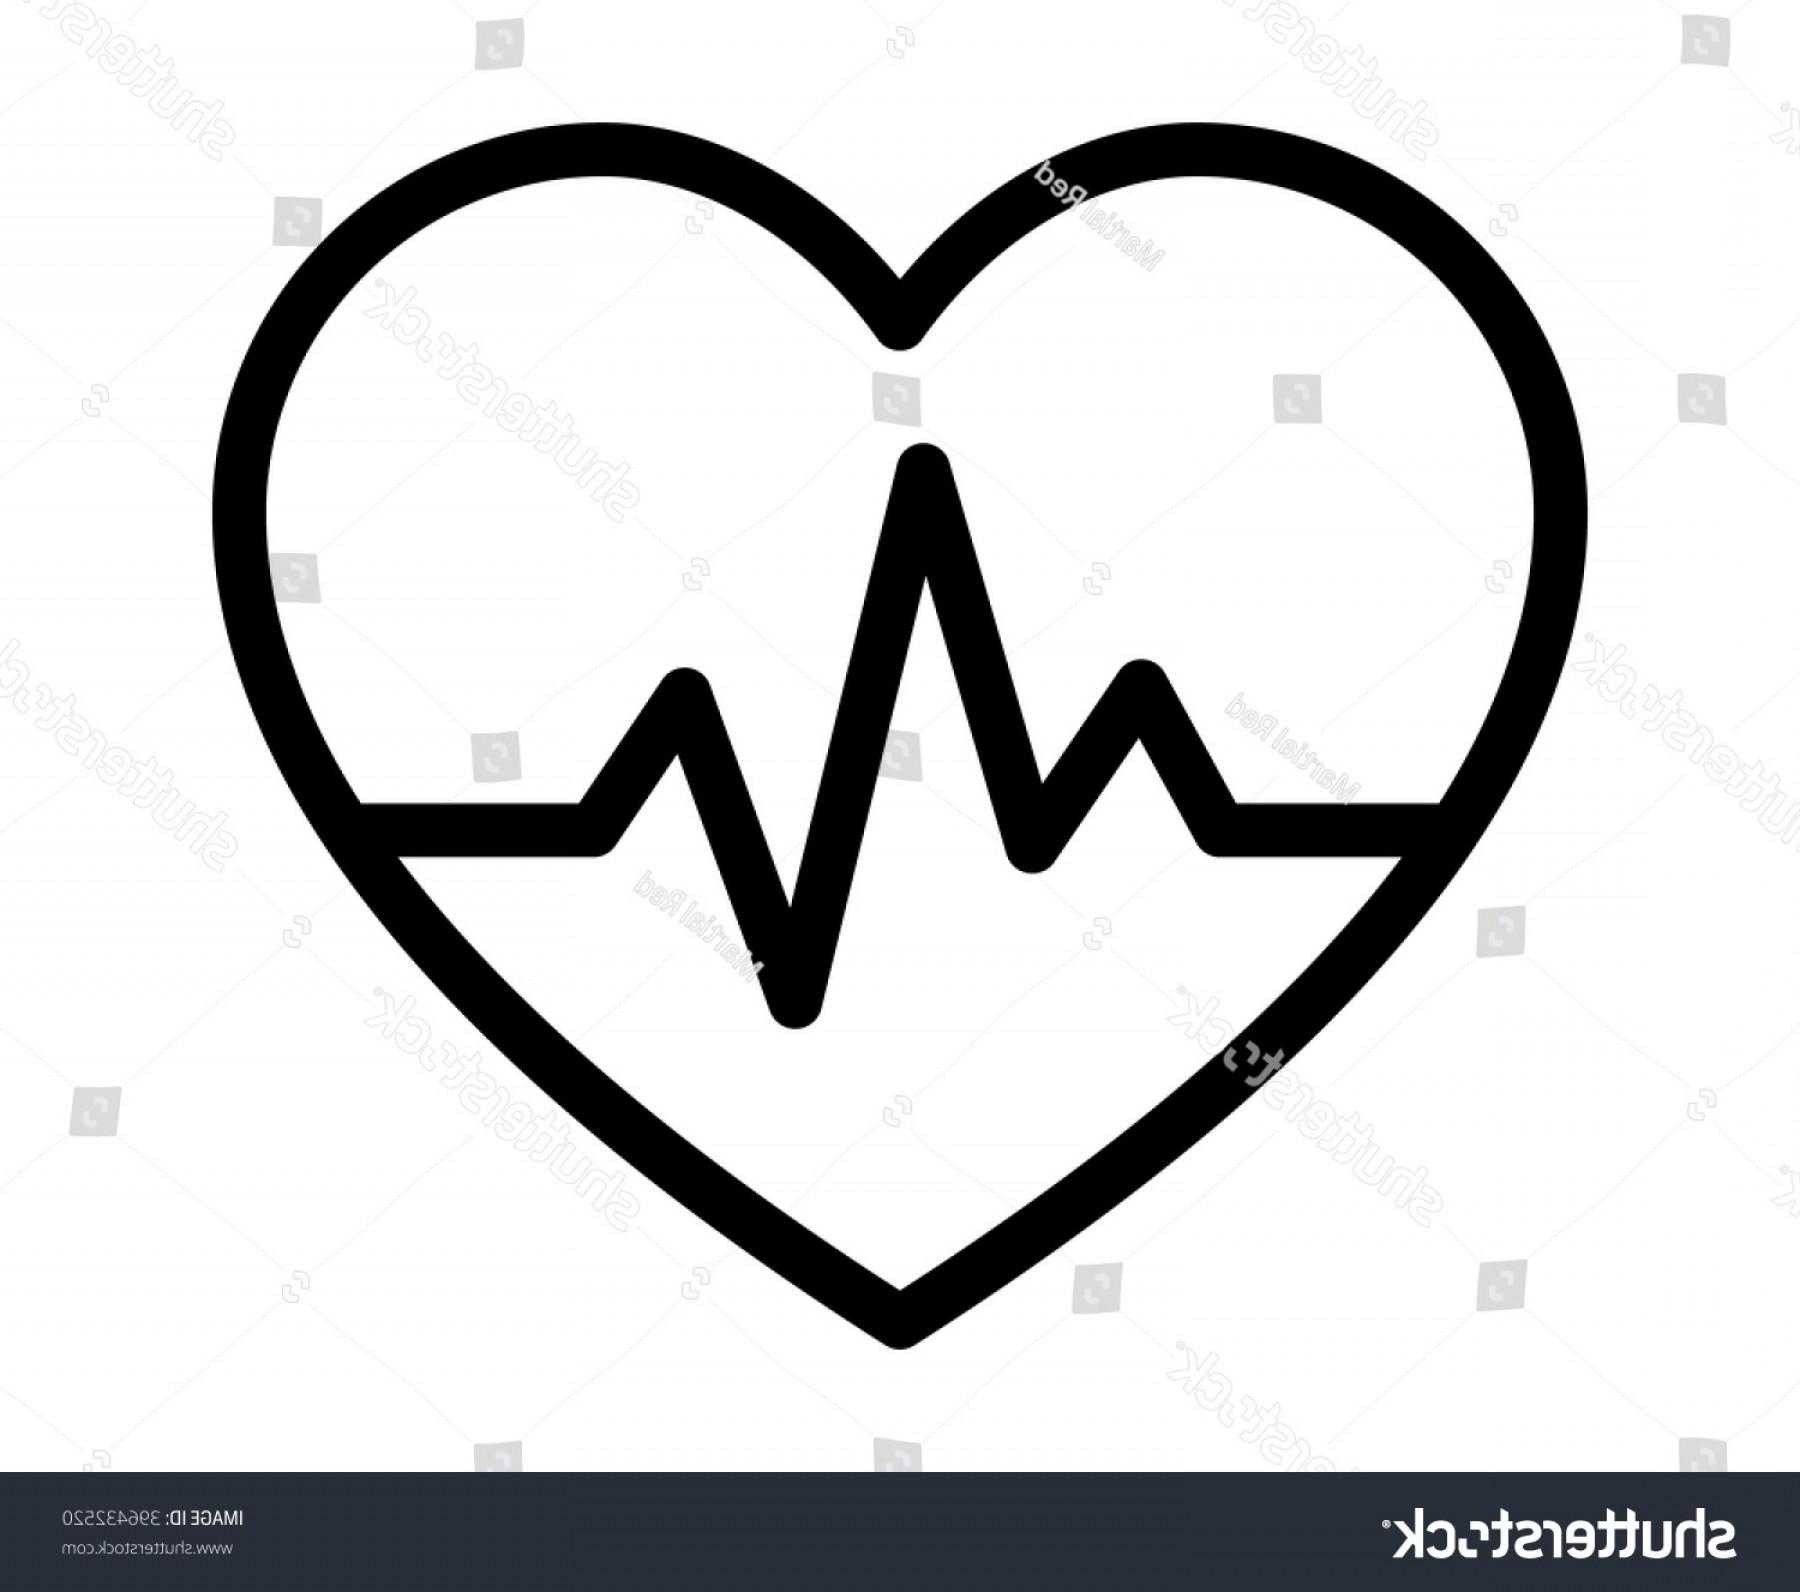 Beat pulse line art. Heartbeat clipart heart middle